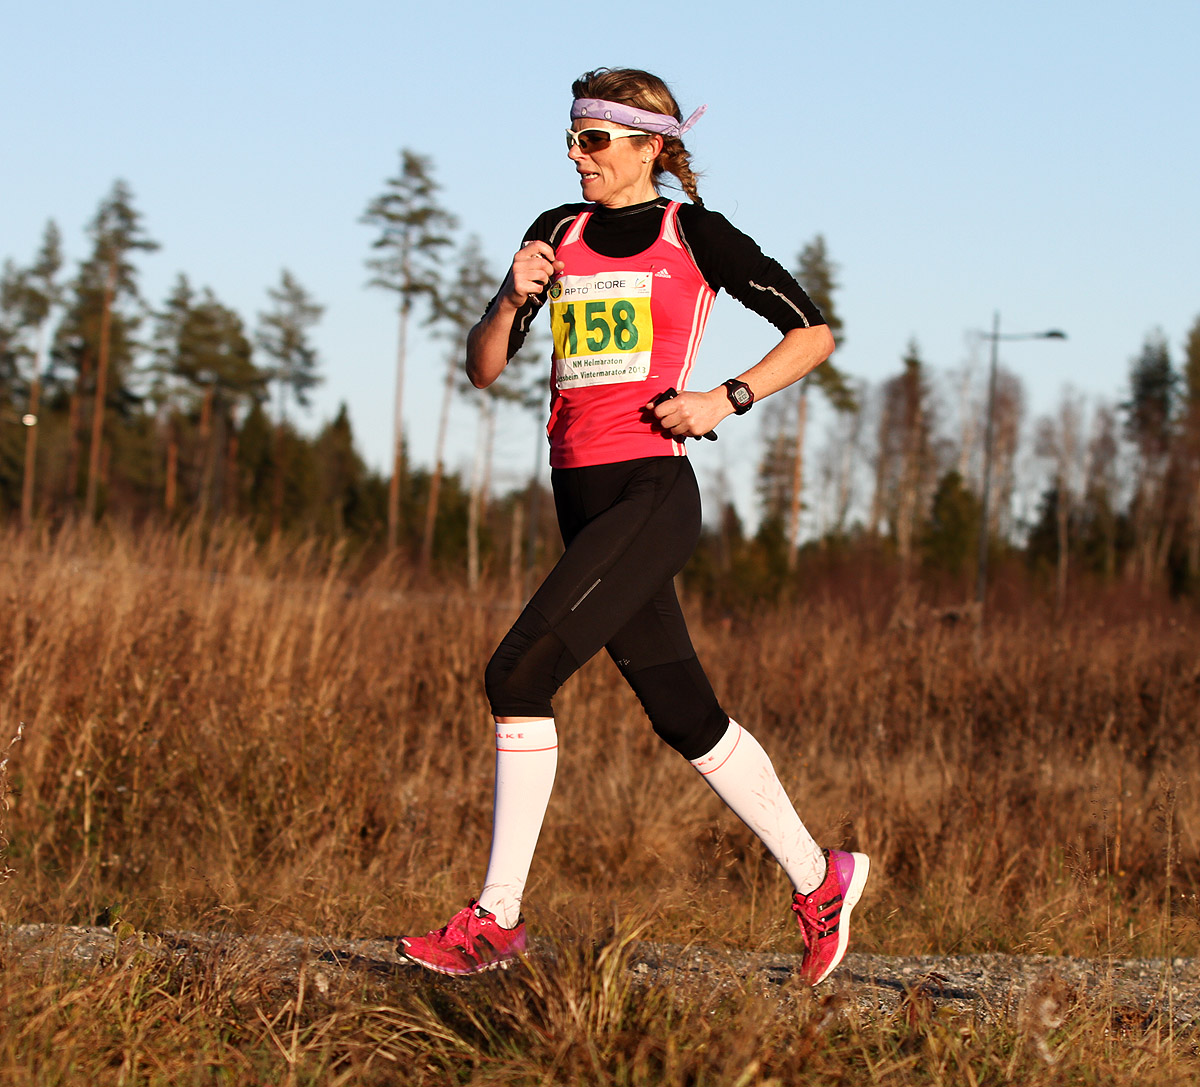 Vintermaraton2013_Dorte-Foss_31-3km.jpg